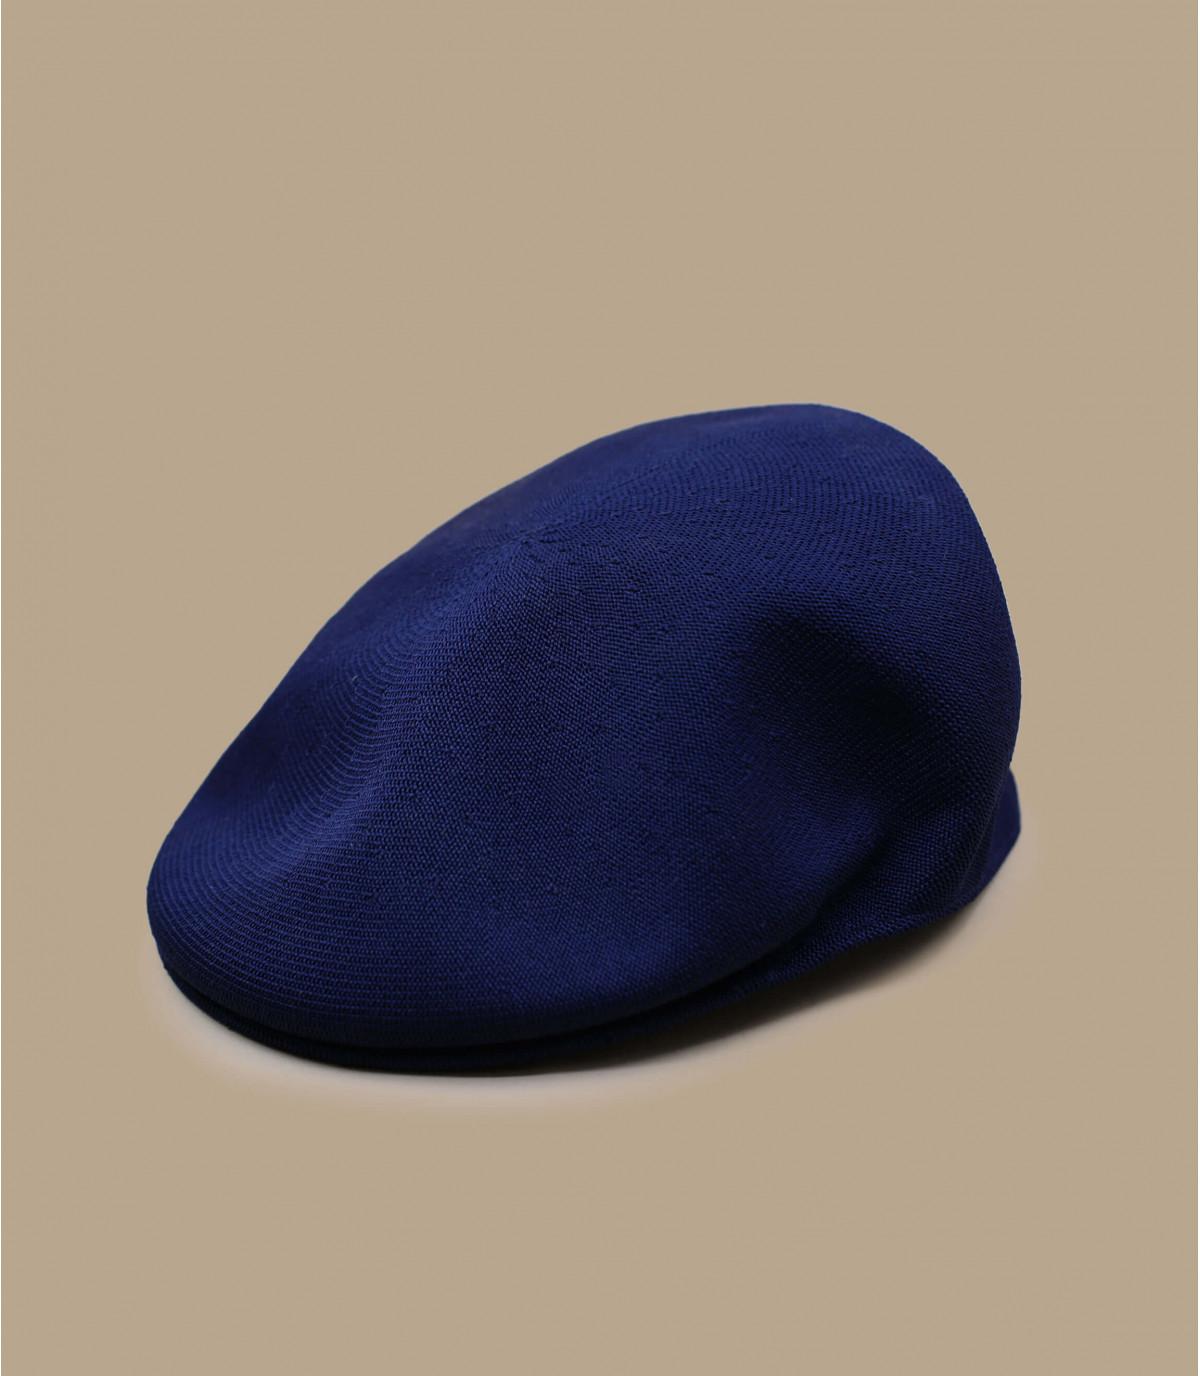 Kangol 504 Sommer marineblau